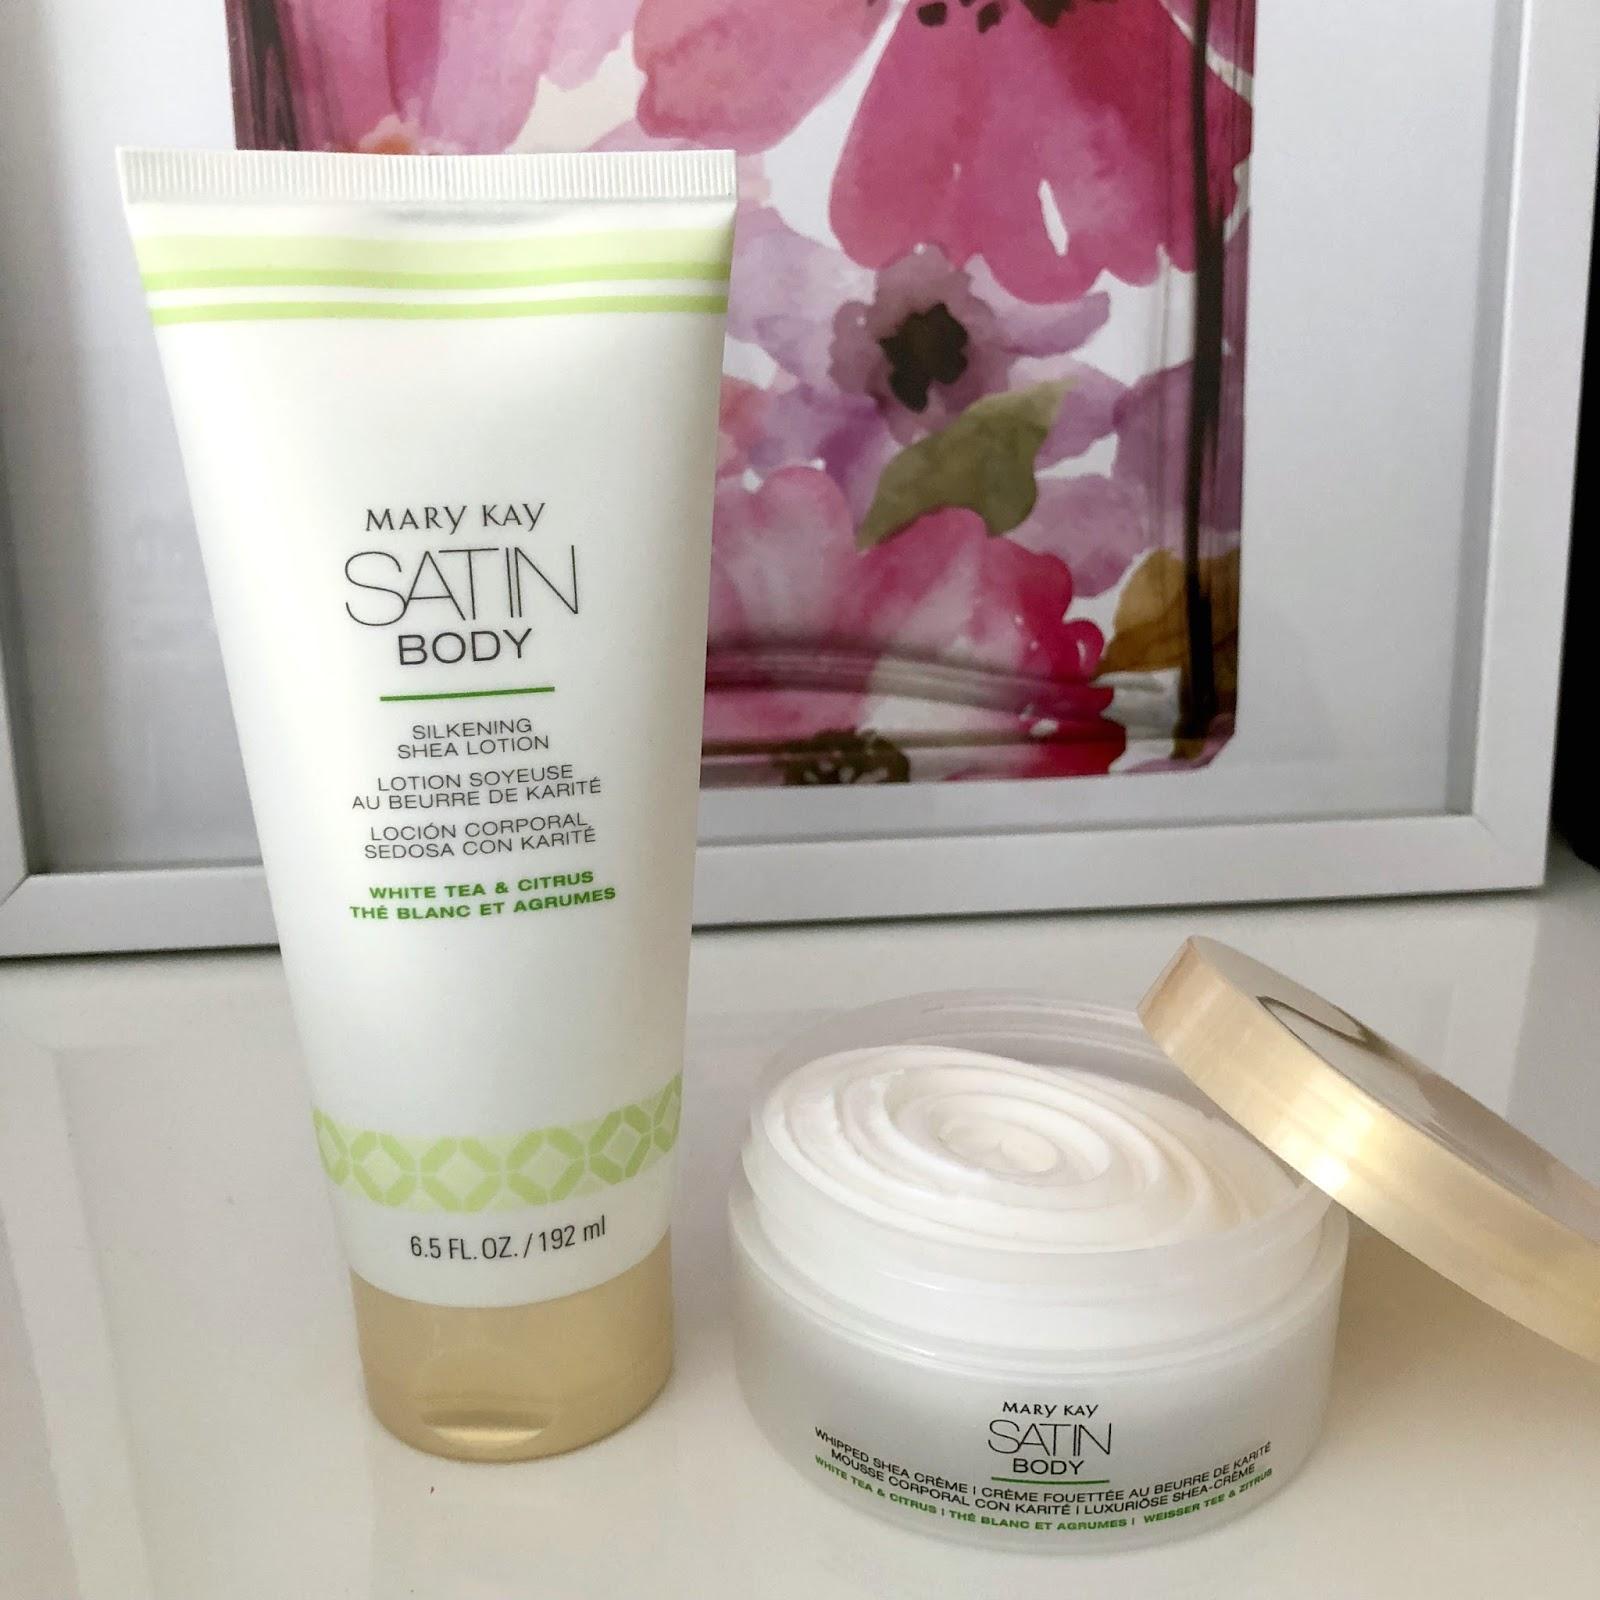 Senka White Beauty Lotion Ii Review: White Tea & Citrus